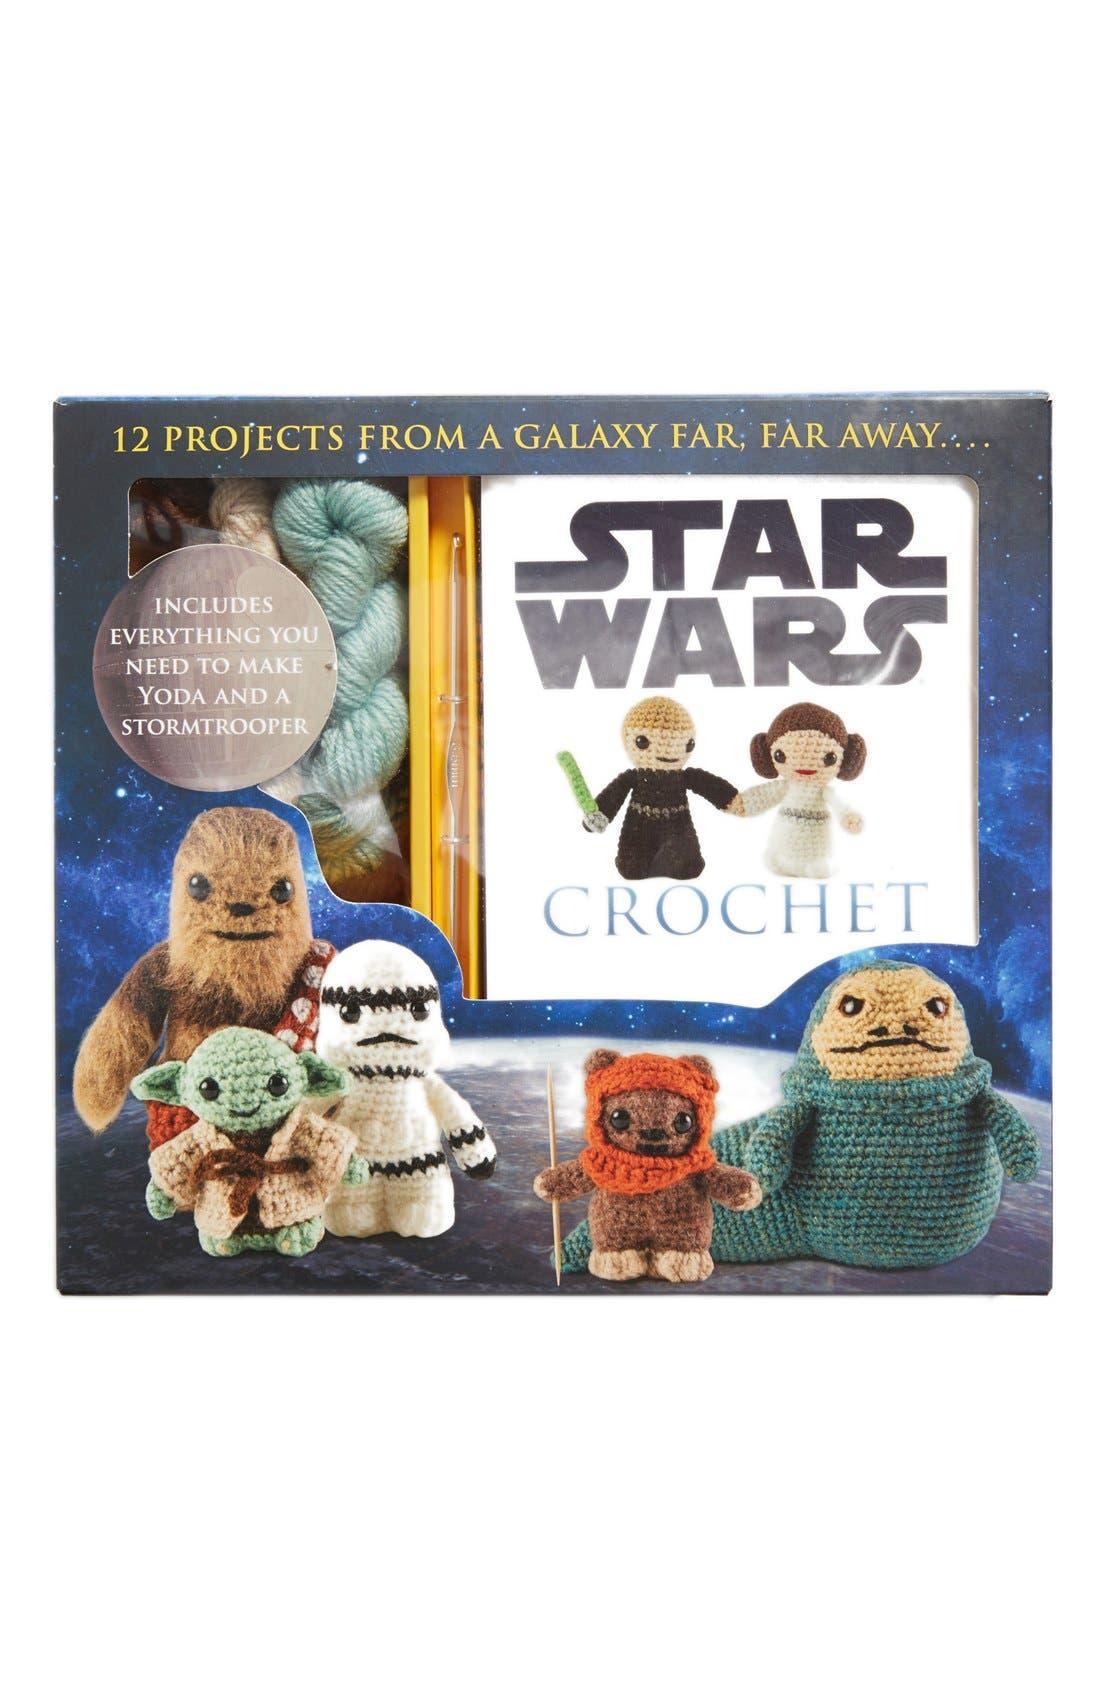 Main Image - Thunder Bay Press 'Star Wars Crochet' Book & Kit